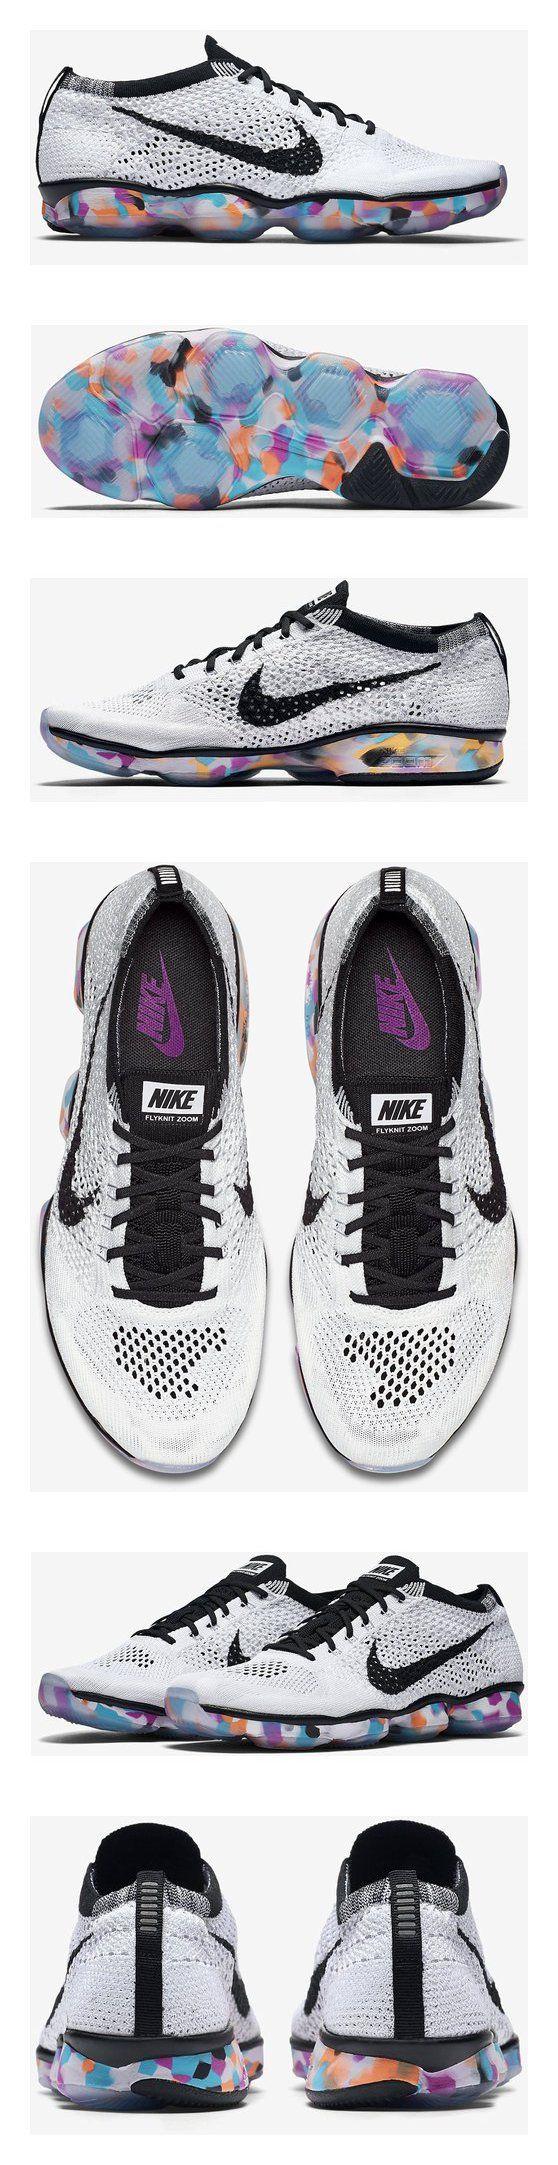 Nike Flyknit Zoom Agility Women's Training Shoe #shoes #sporting_goods #nike #fashion_sneakers #women #departments #skateboarding #athletic #men #2006